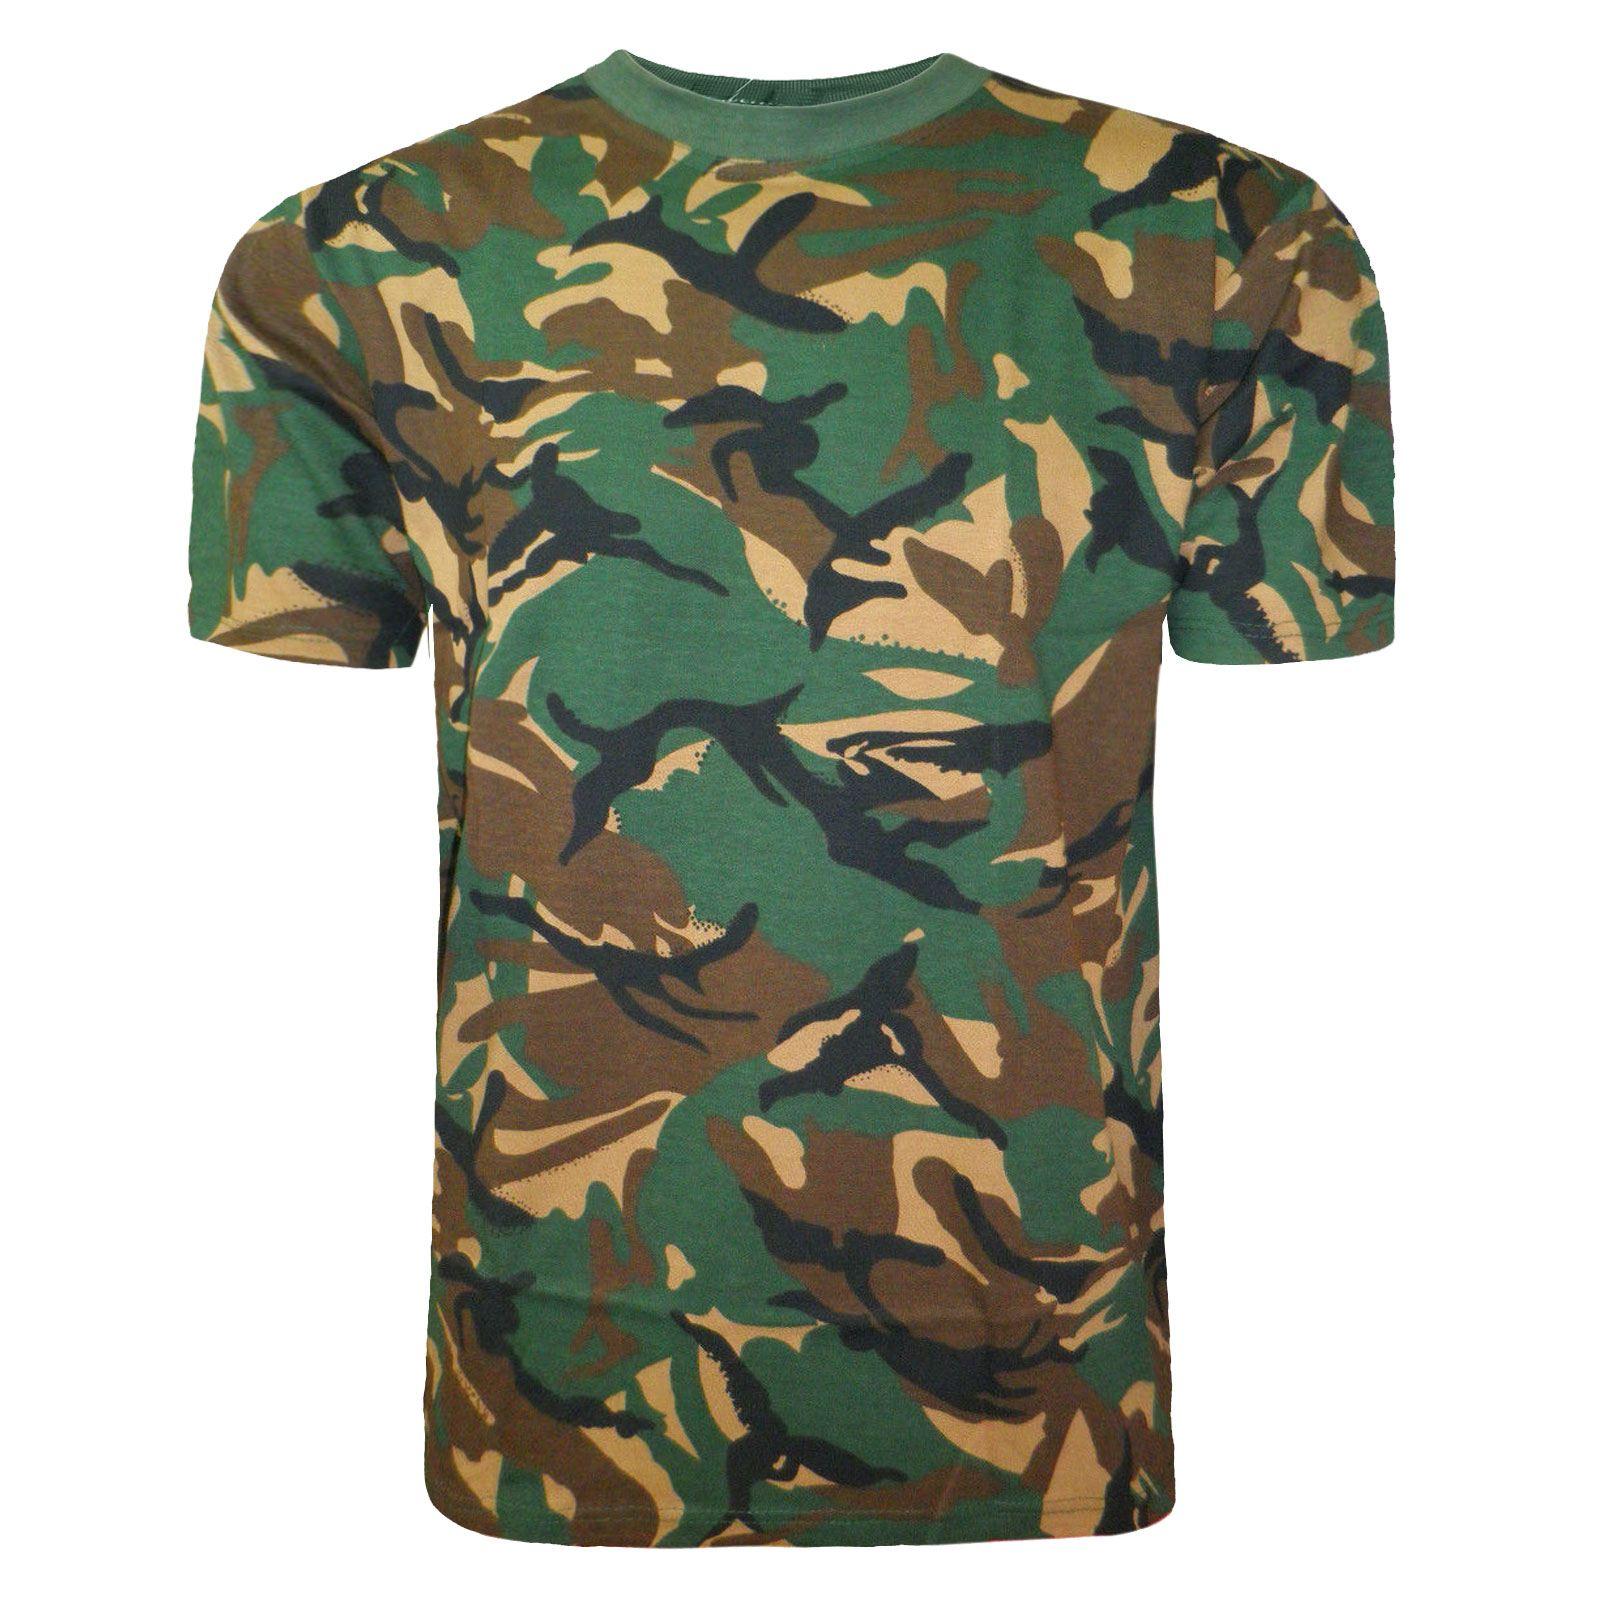 Kids camouflage t shirt military hunting fishing camo army for Camo fishing shirts